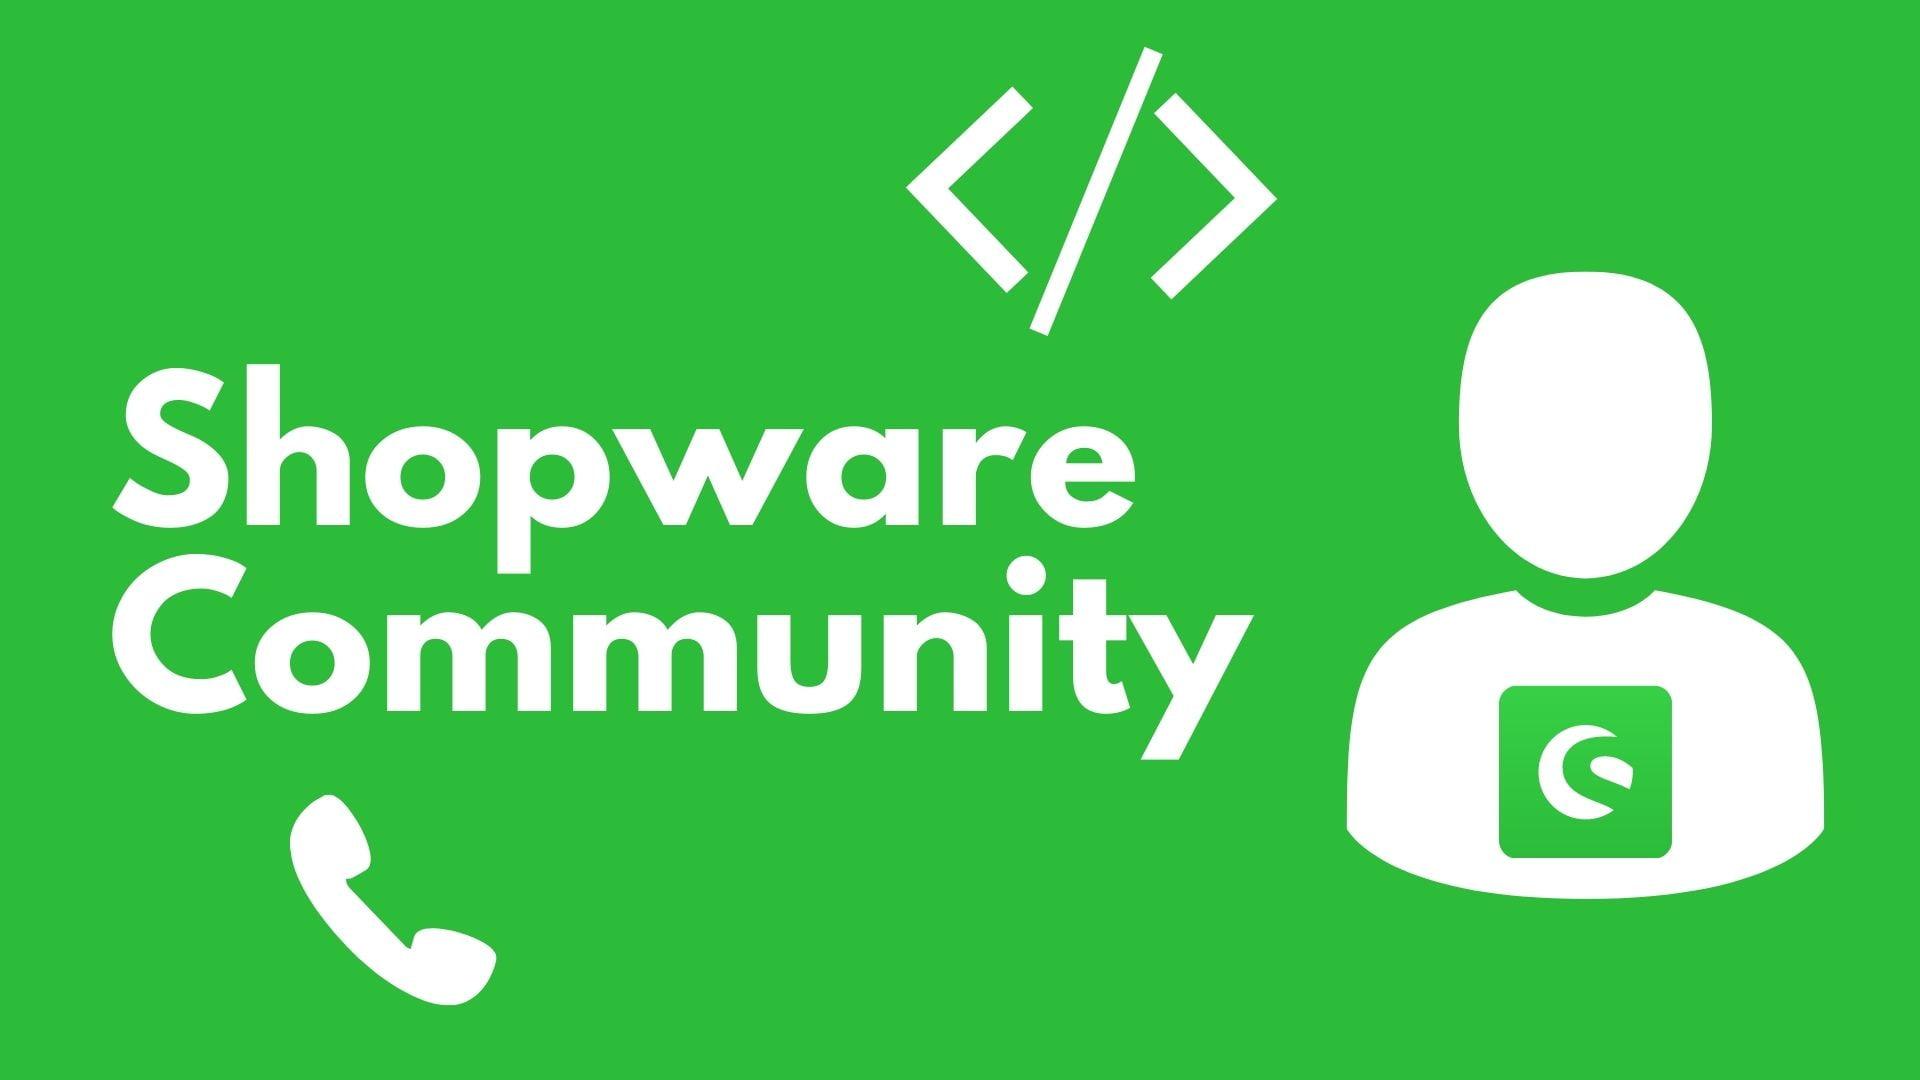 Shopware community edition